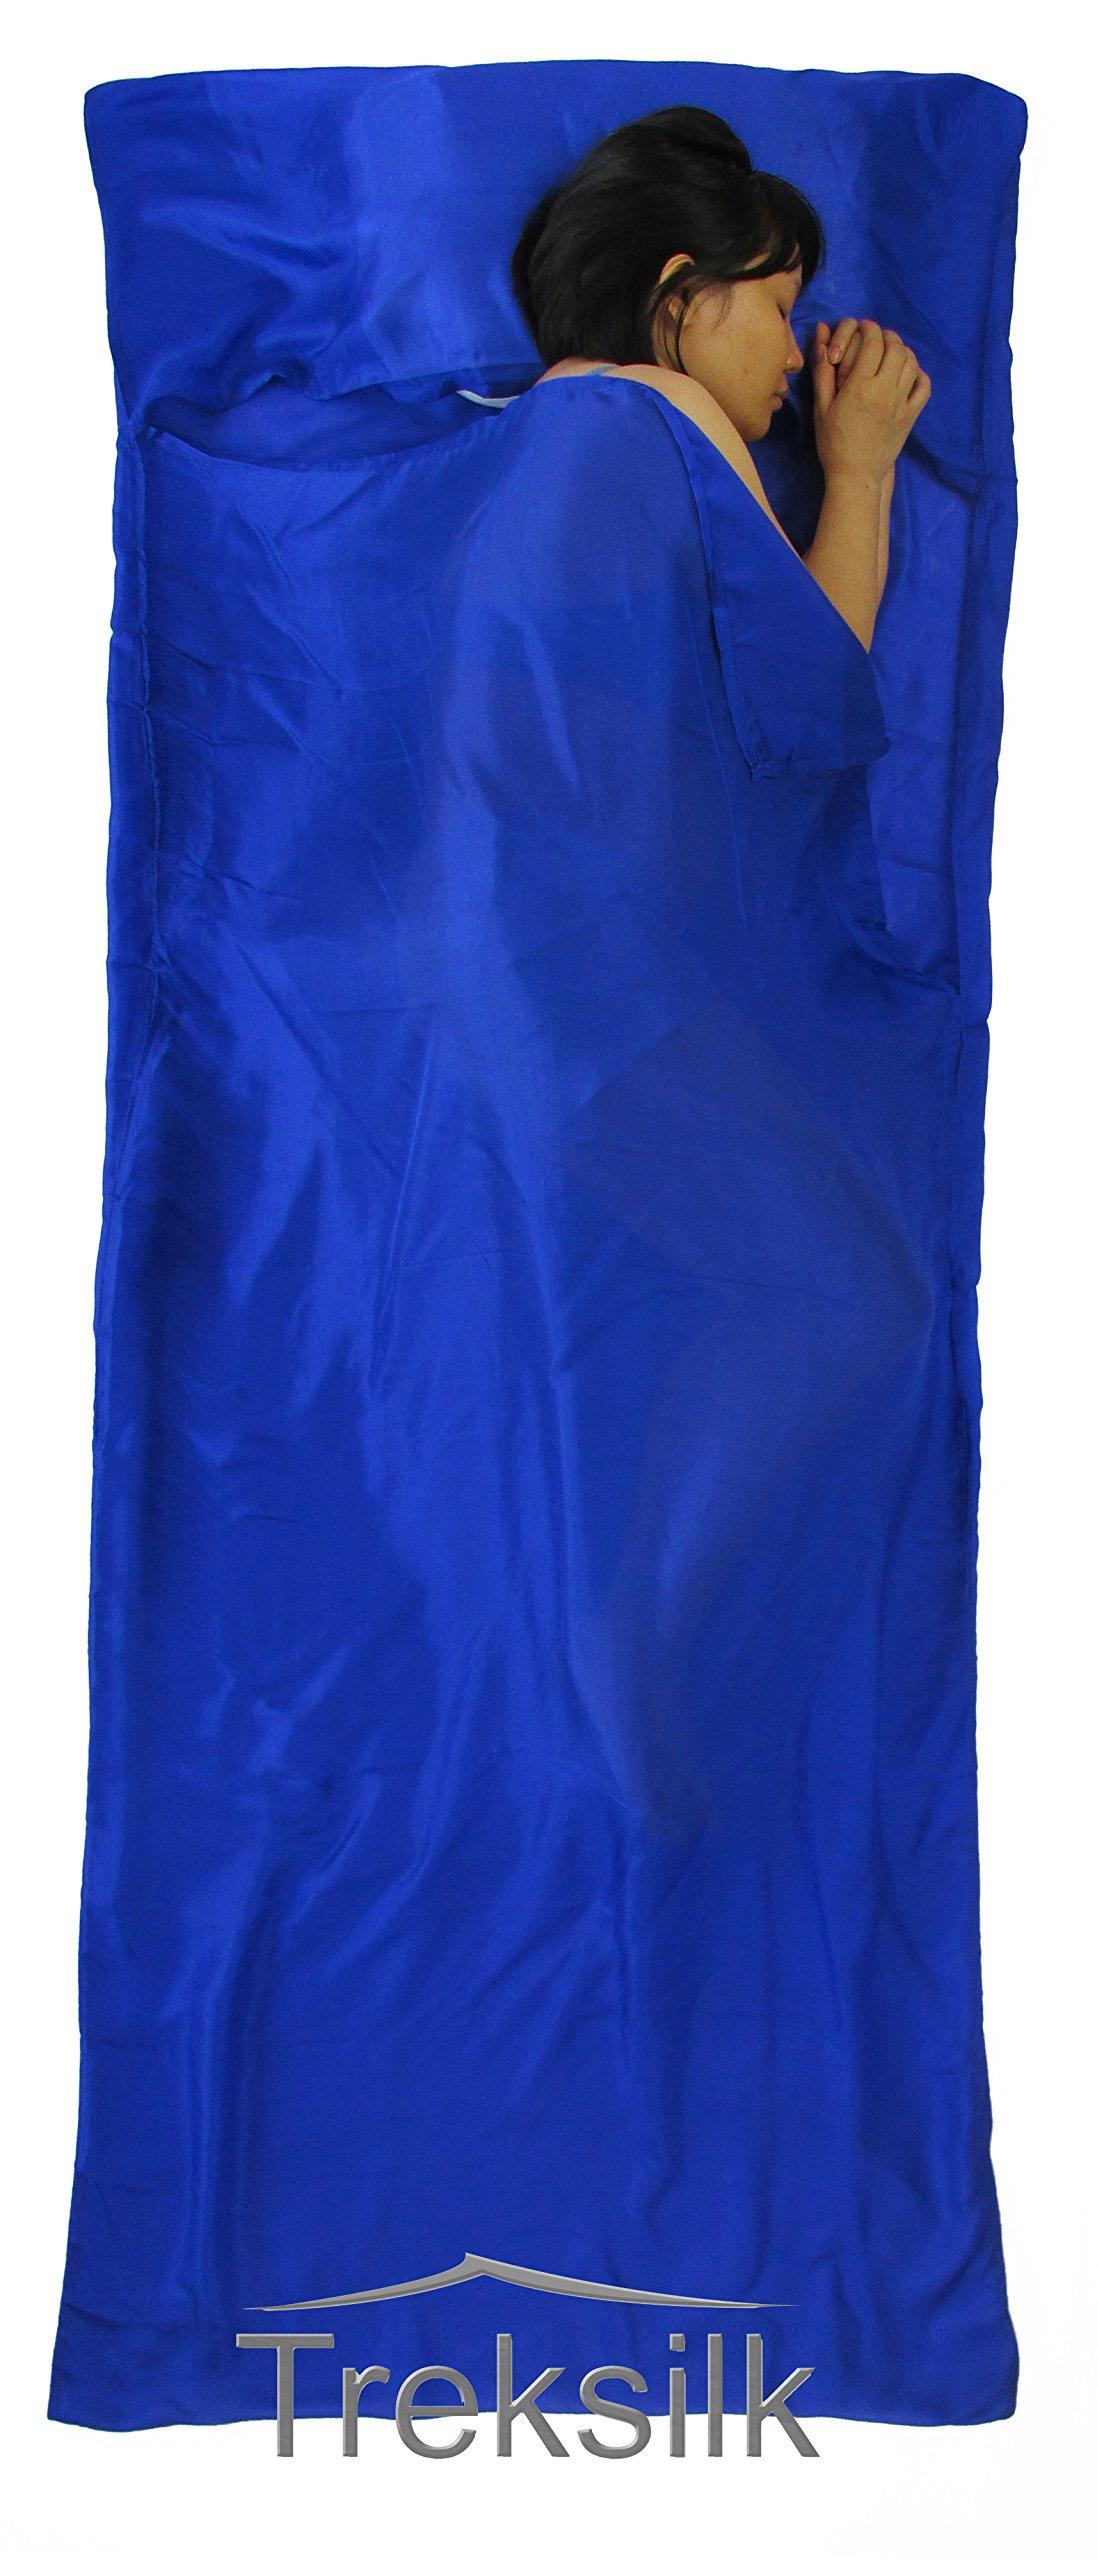 Treksilk: 240 cm! 100% Mulberry Silk Single Sleeping Bag Liner Travel Sheet Sack (Royal Blue) by Treksilk